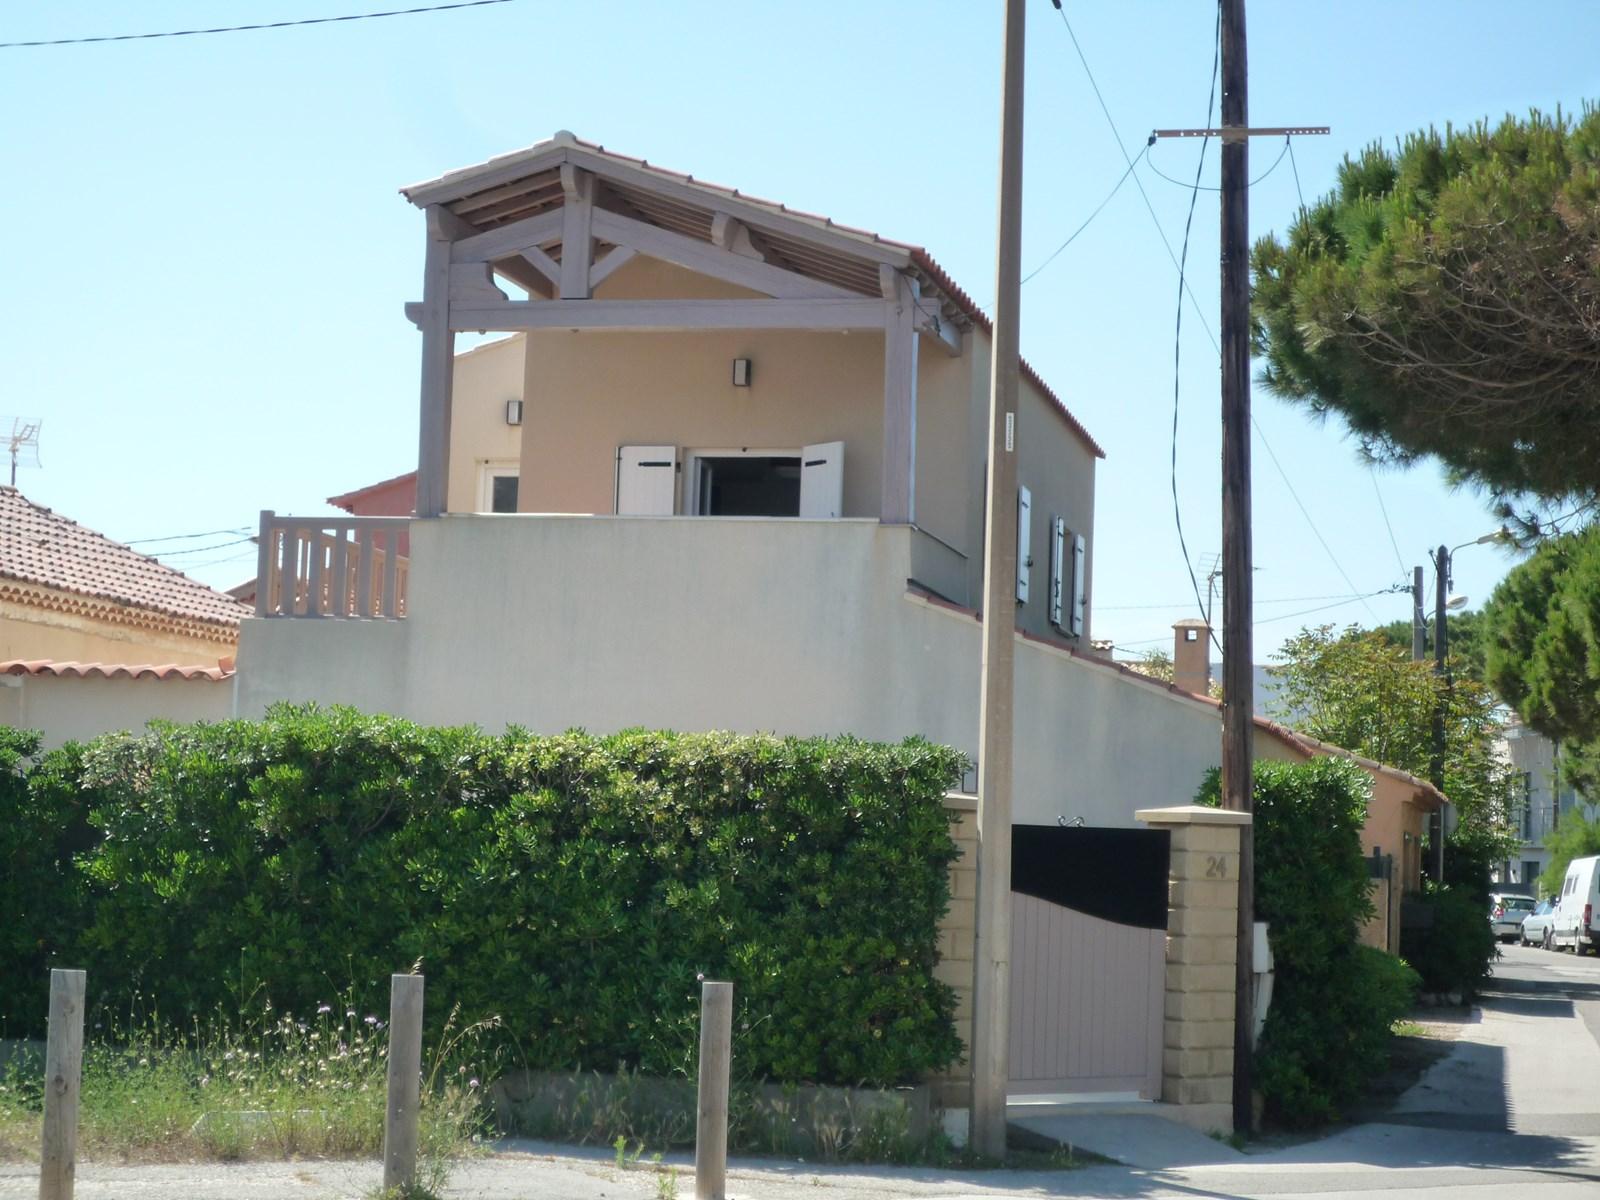 Villa Mitoyenne Hyères (La Capte)